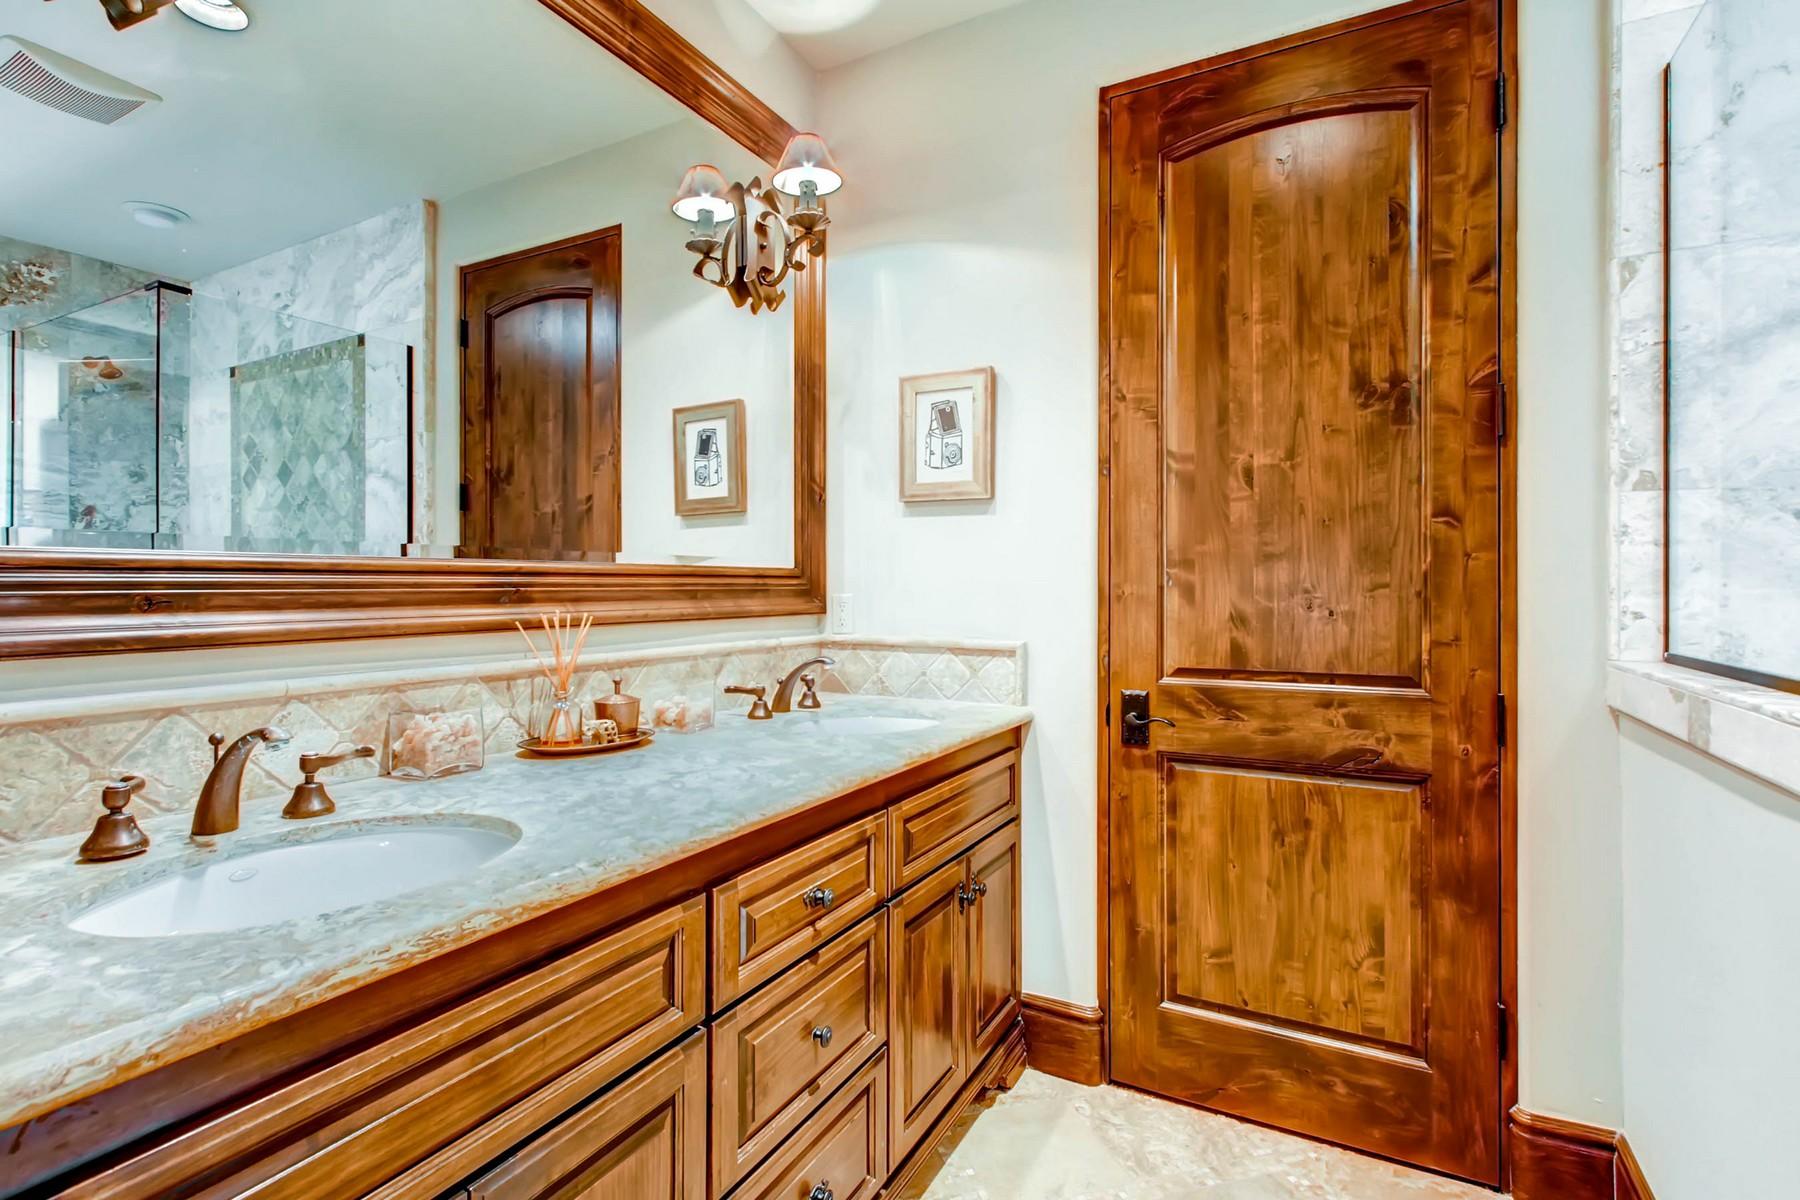 Additional photo for property listing at 1904 Estrada Way  La Jolla, California 92037 United States